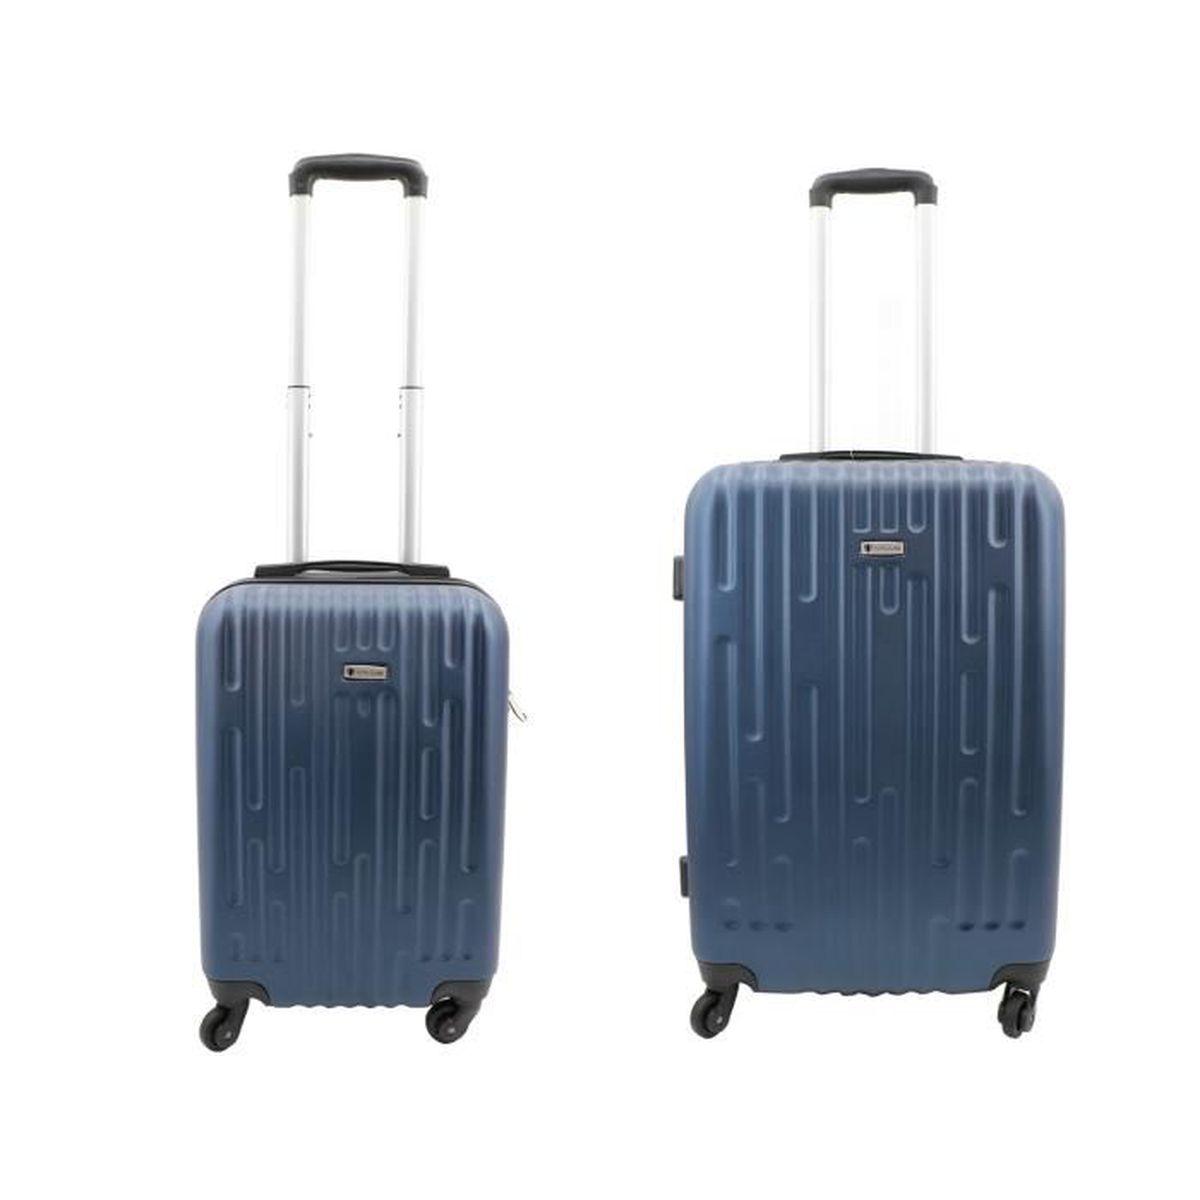 SET DE VALISES Lot de 2 valises Worldline, valise cabine rigides